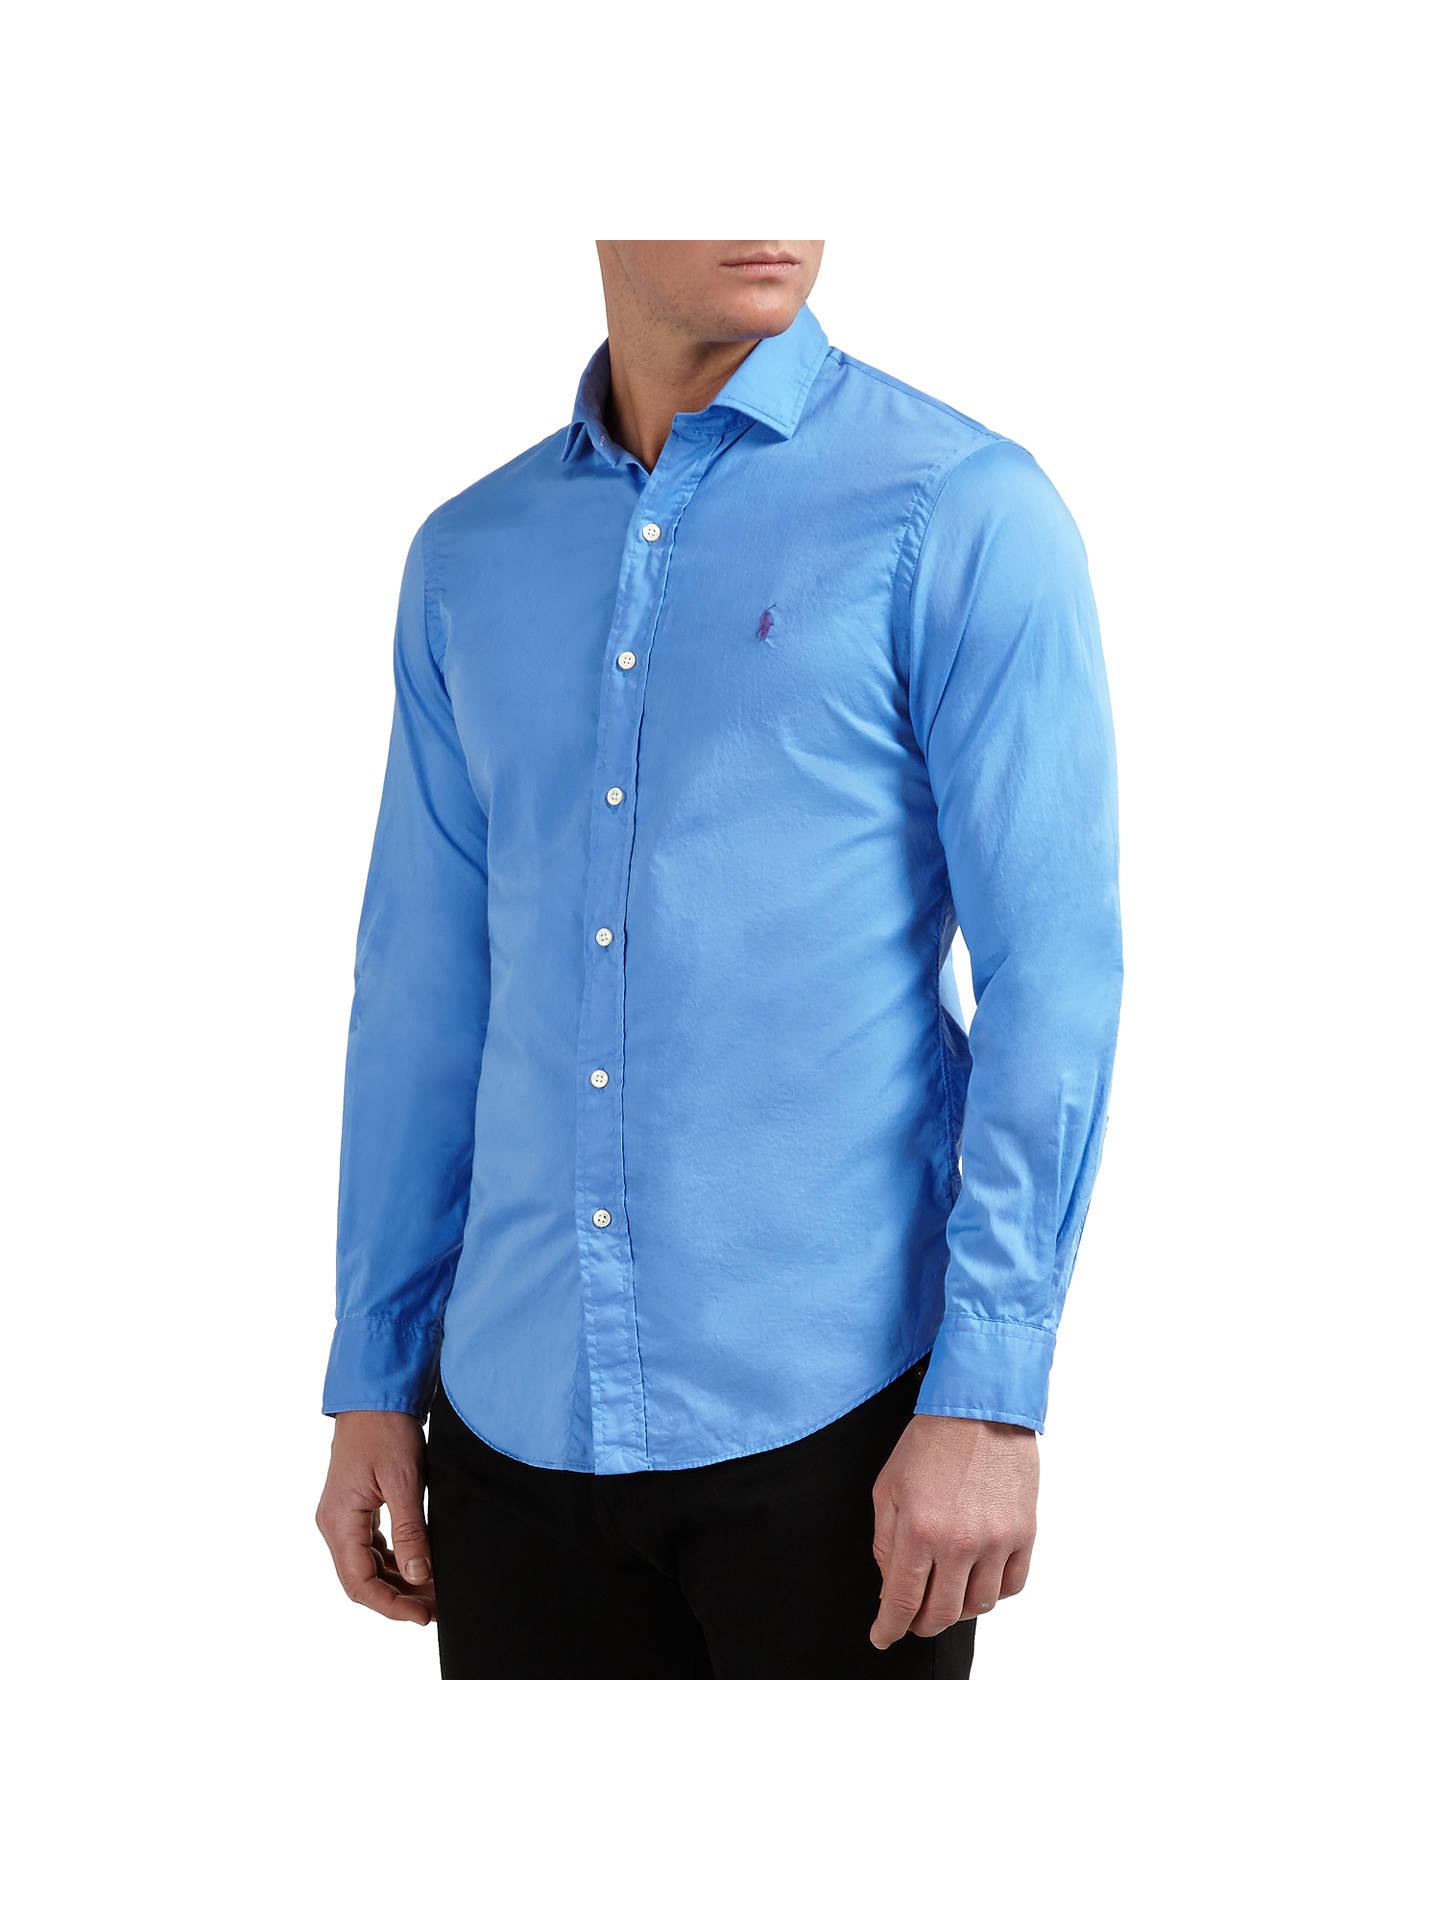 deeaa578ee8 Buy Polo Ralph Lauren Spread Collar Shirt